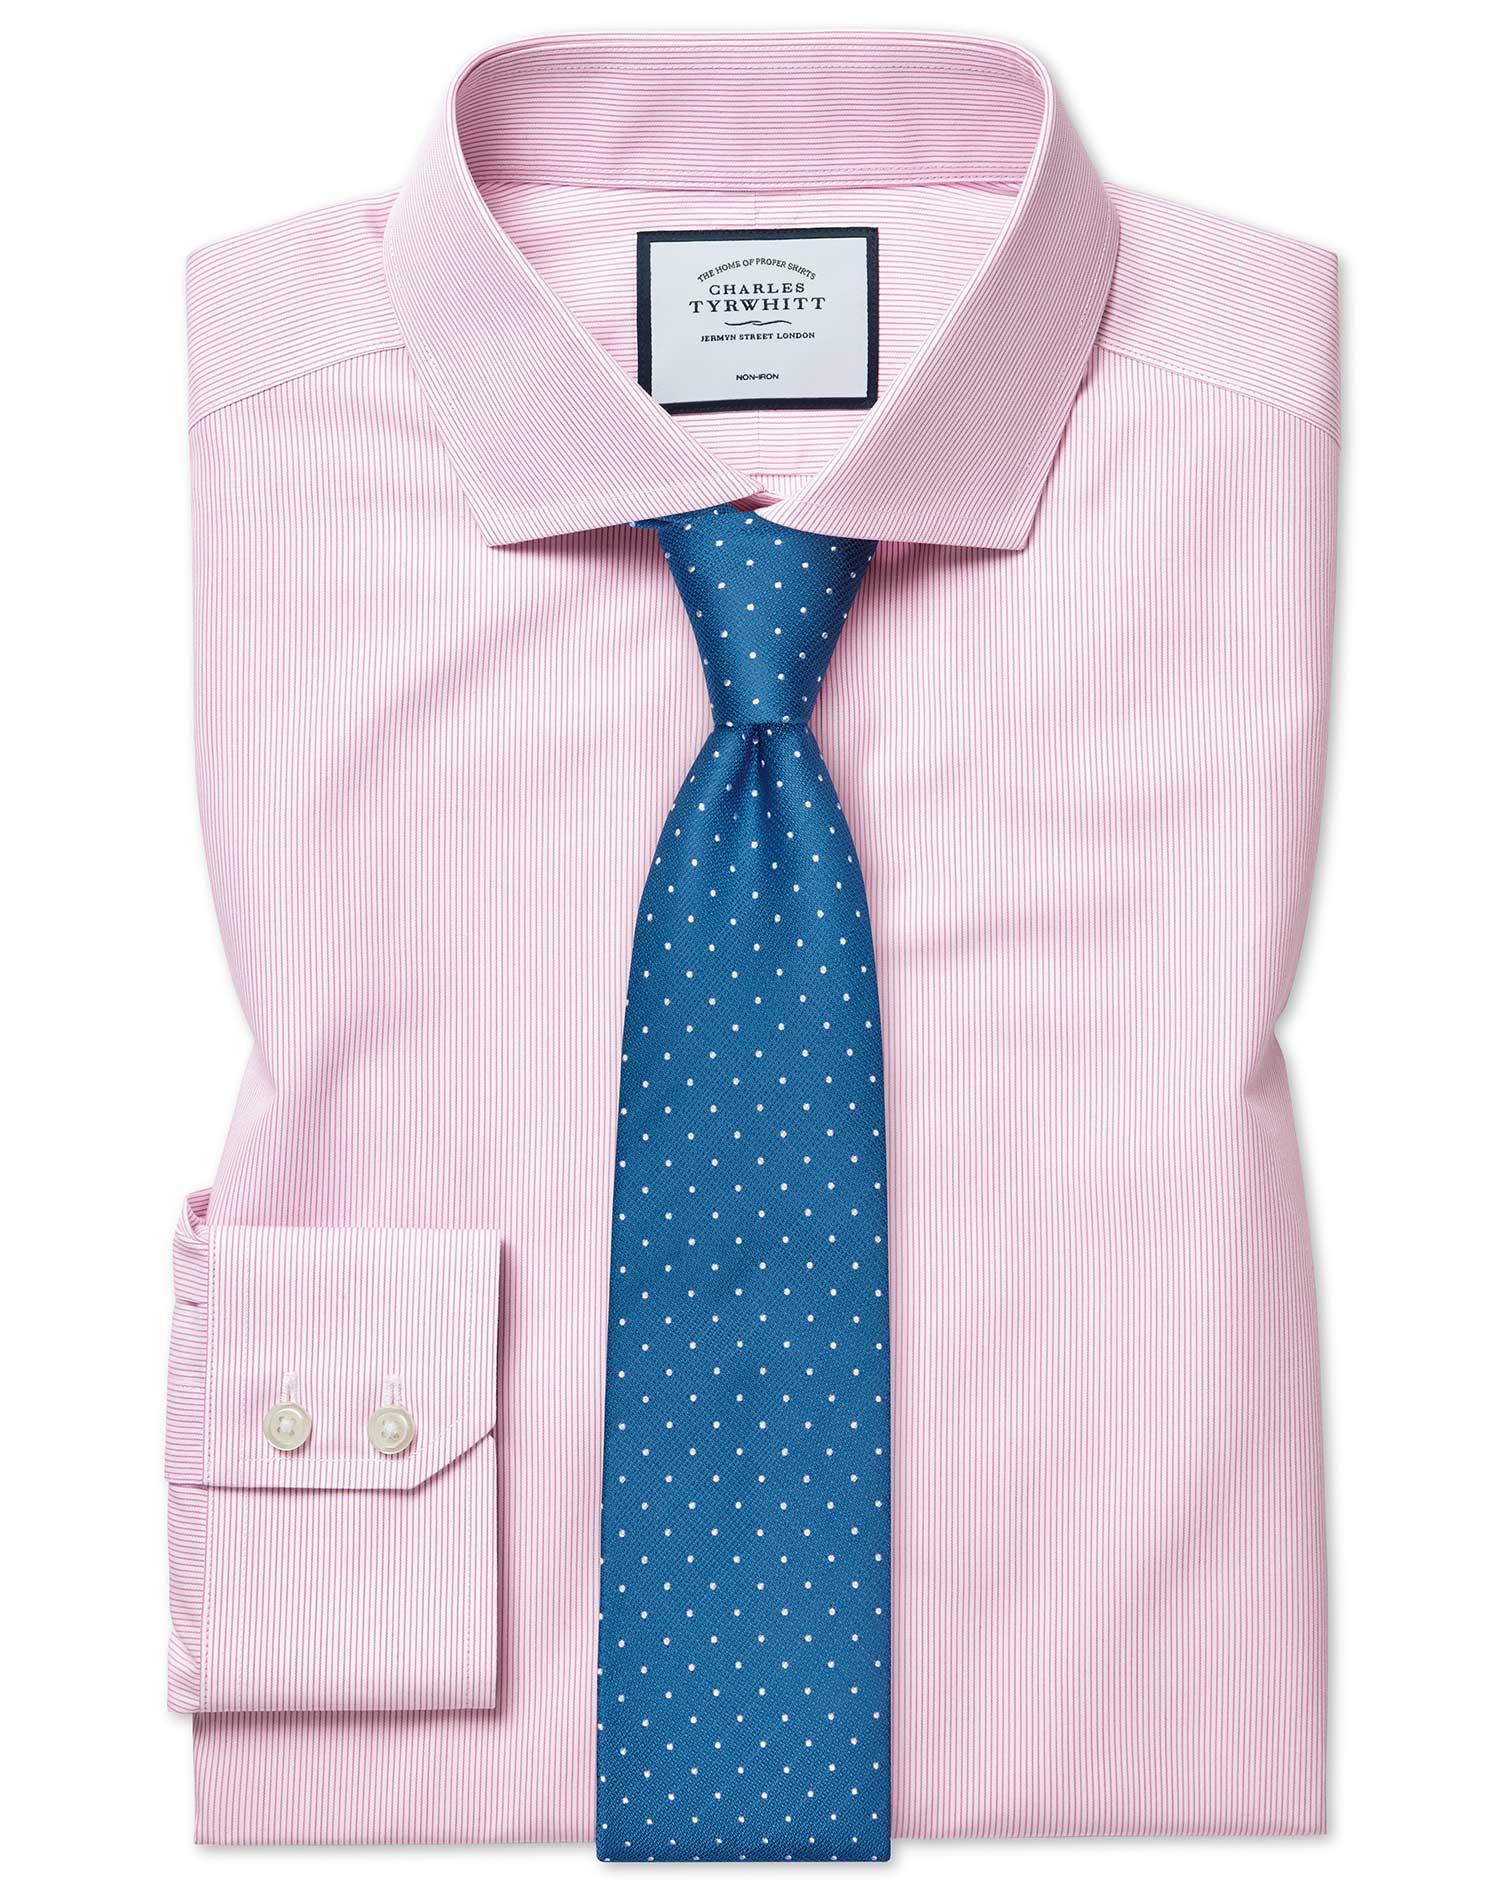 Cotton Slim Fit Non-Iron Tyrwhitt Cool Poplin Pink Stripe Shirt